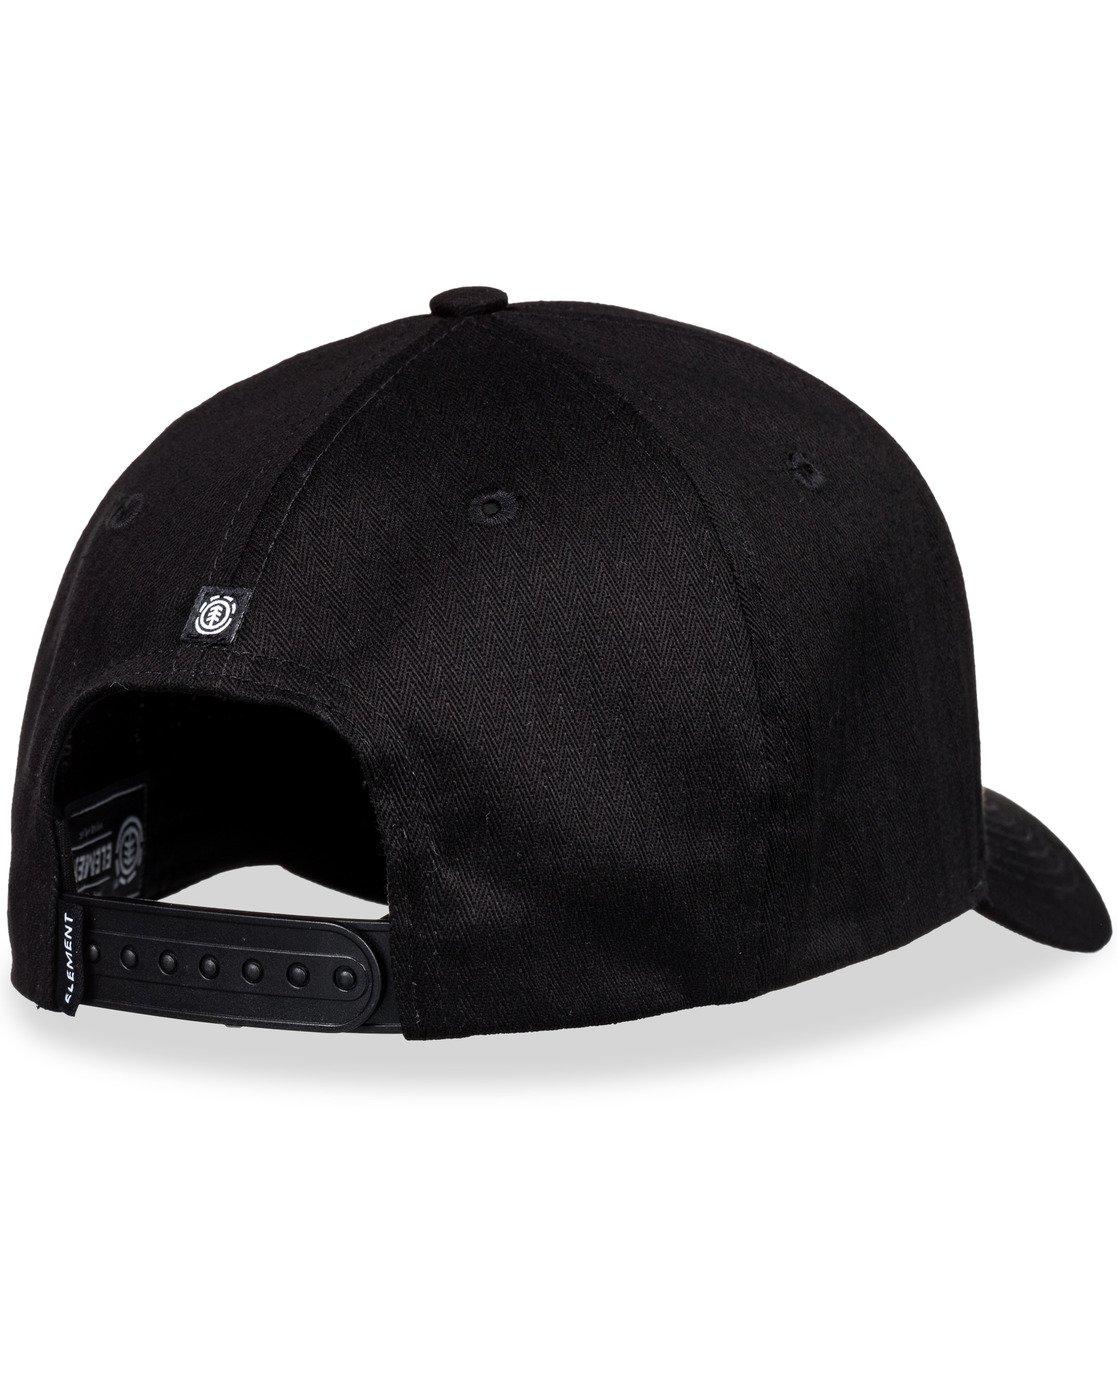 5 Wild Snapback Hat Black MAHT3EWI Element